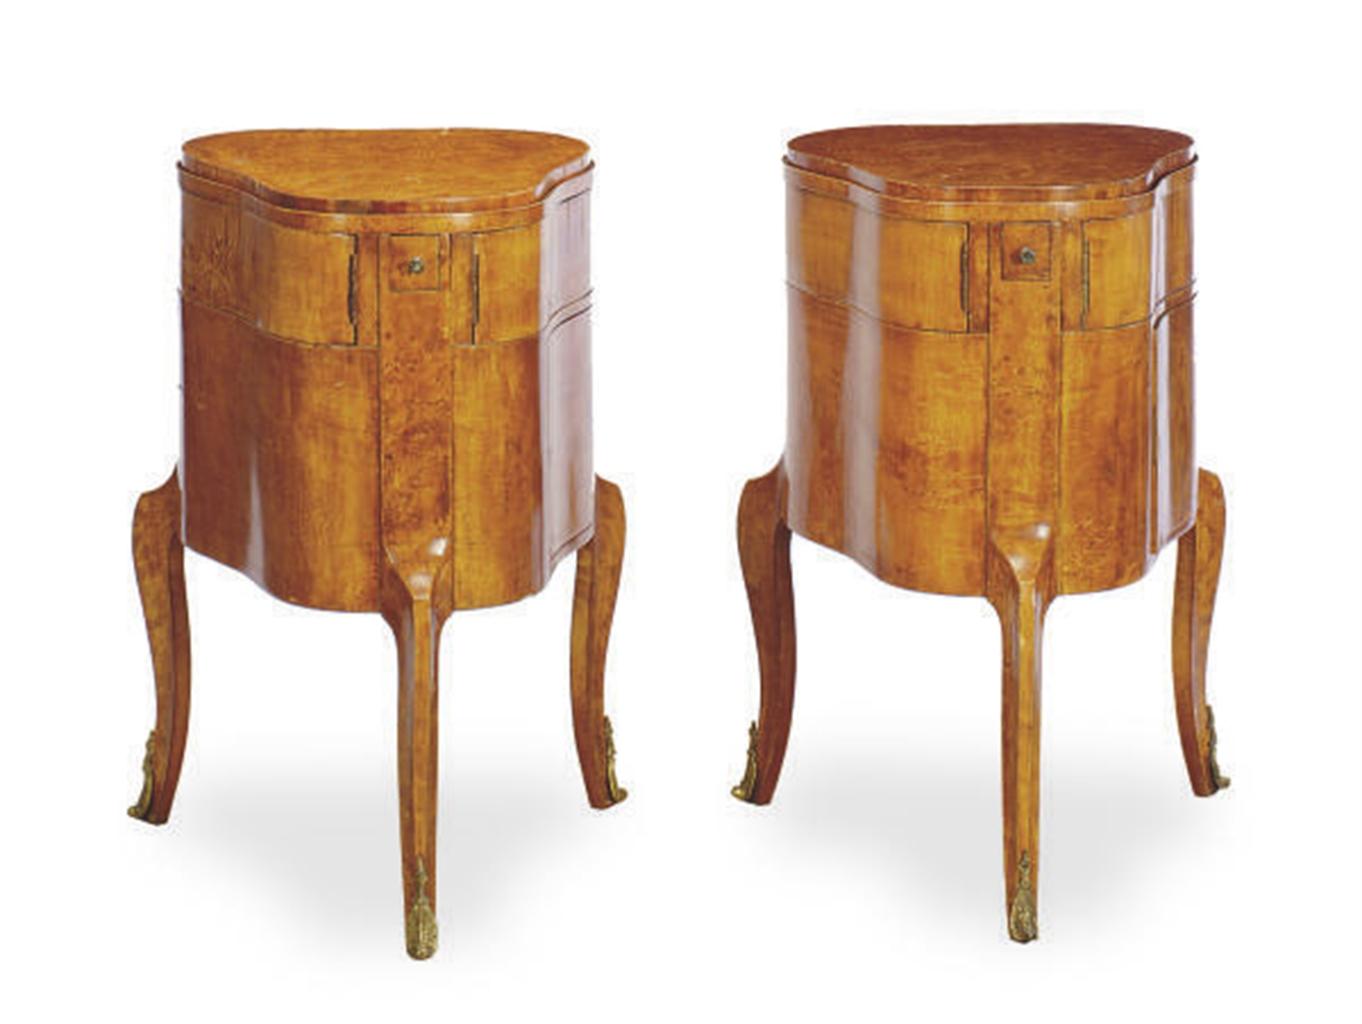 A Pair Biedermeier Style Karelian Birch Pear Form Dressing Tables 20th Century Furniture